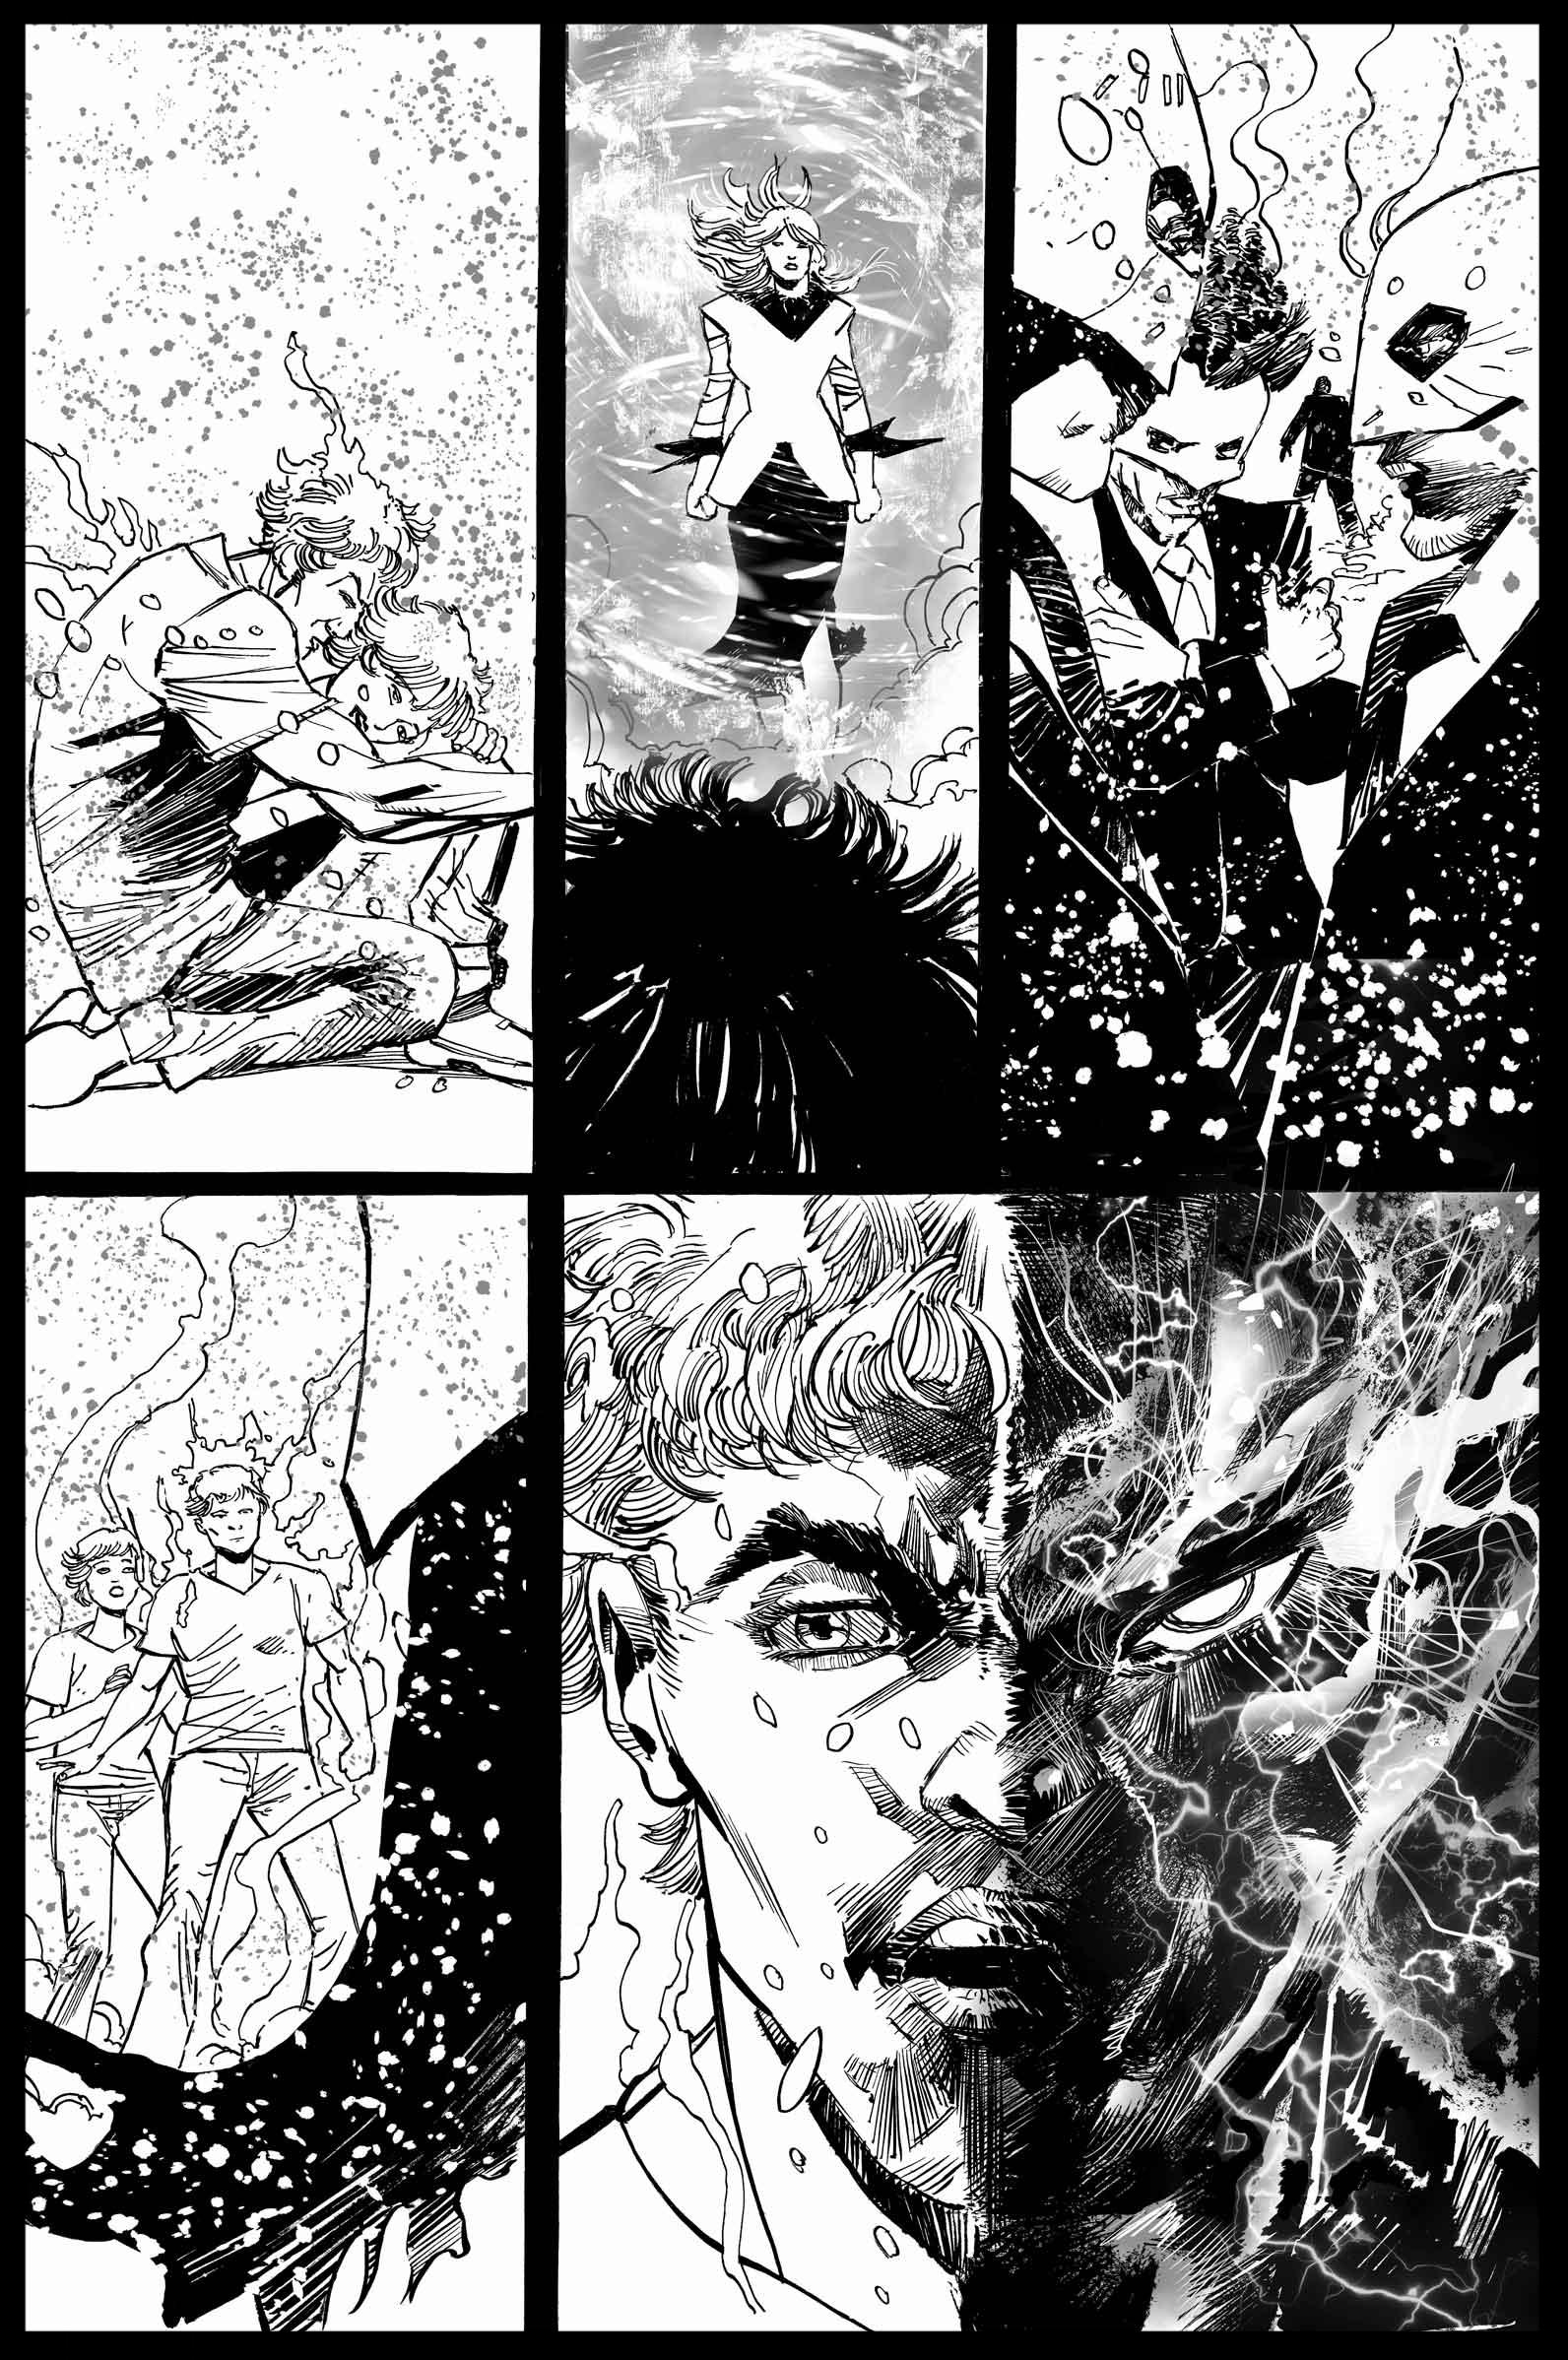 Brimstone #11 - Page 5 - Pencils & Inks